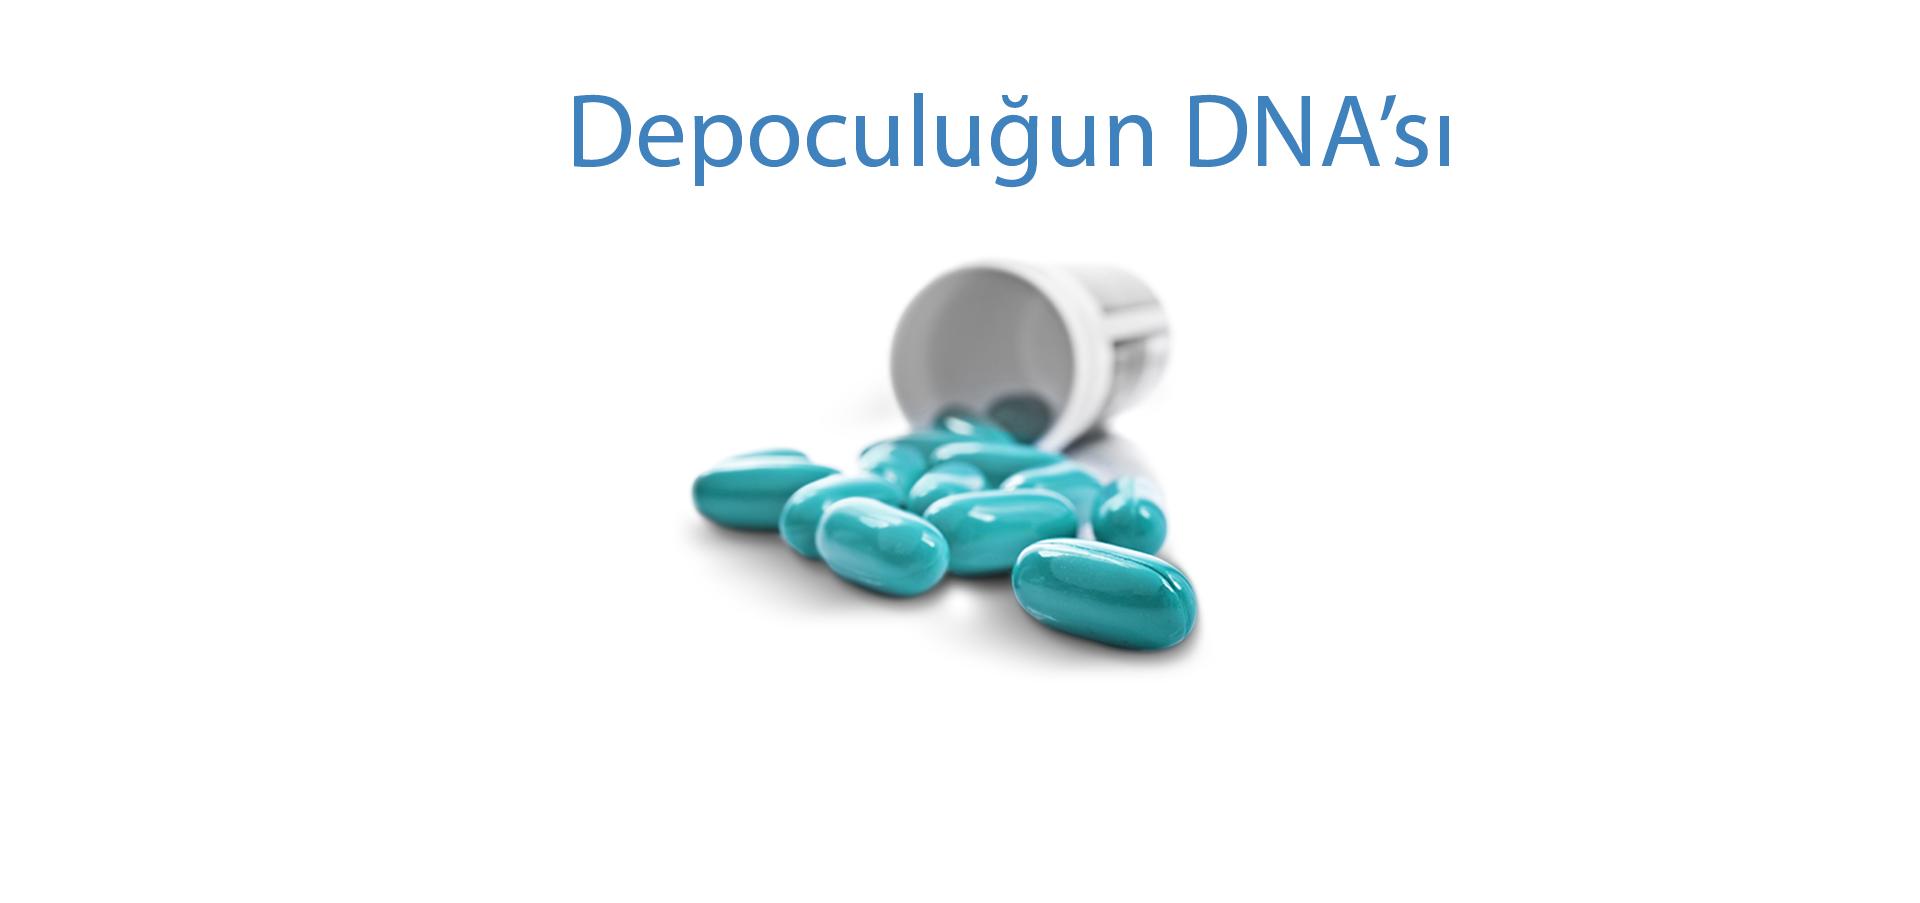 Depoculuğun DNA'sı